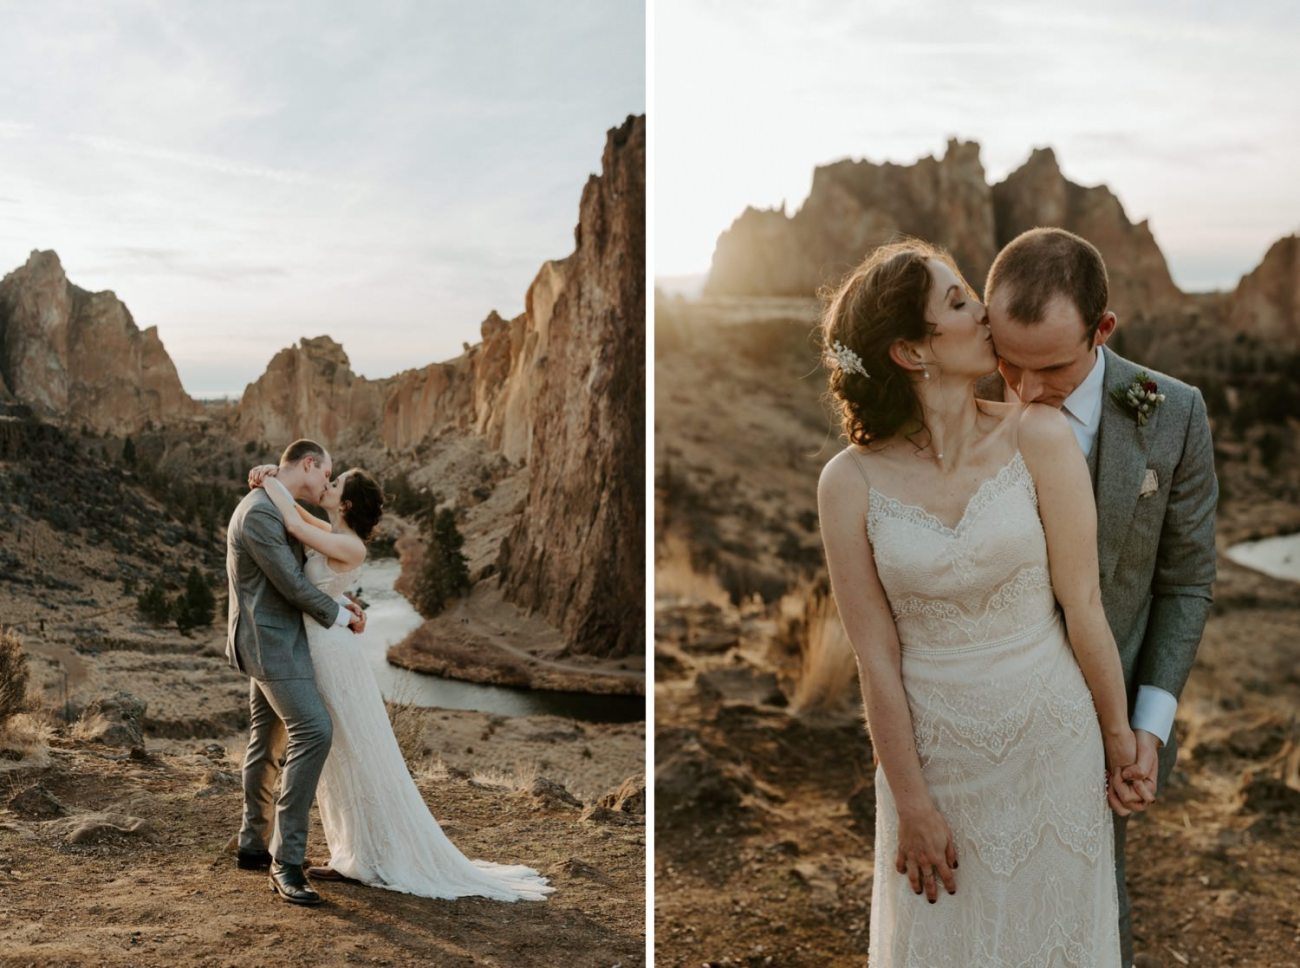 Smith Rock State Park Elopement Bend Oregon Elopement Photographer Anais Possamai Photography 017